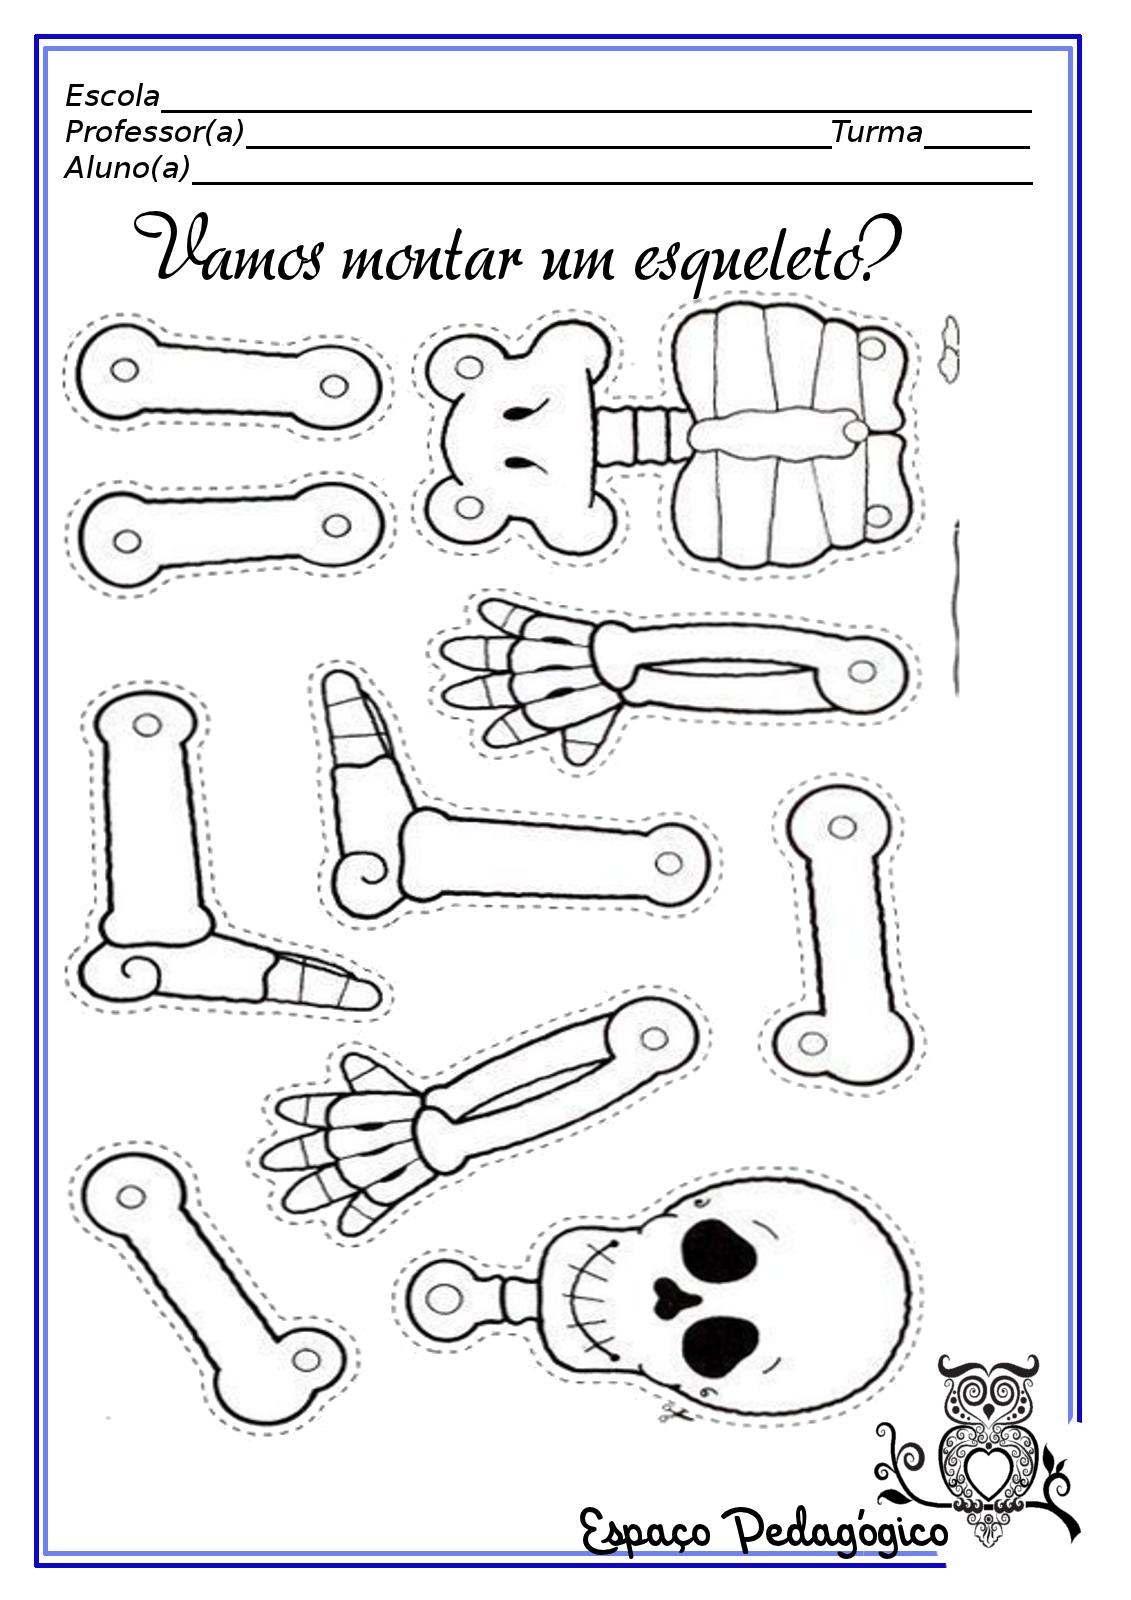 Atividade Desenho Molde Do Esqueleto Para Recortar Pintar E